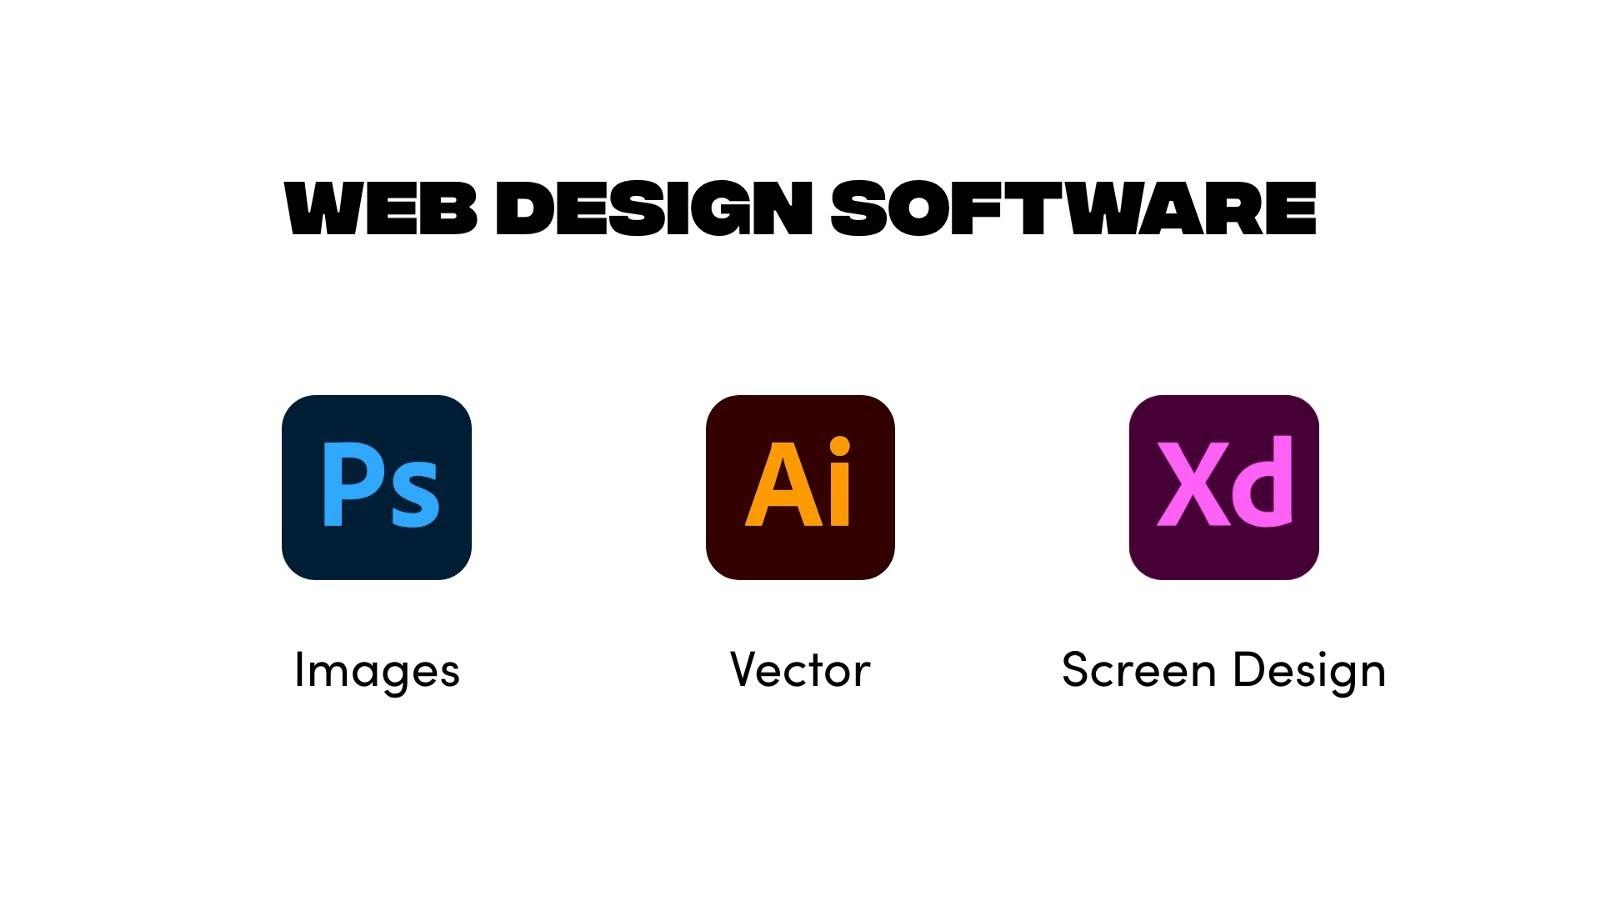 Photoshop, Illustrator and Adobe XD app icons